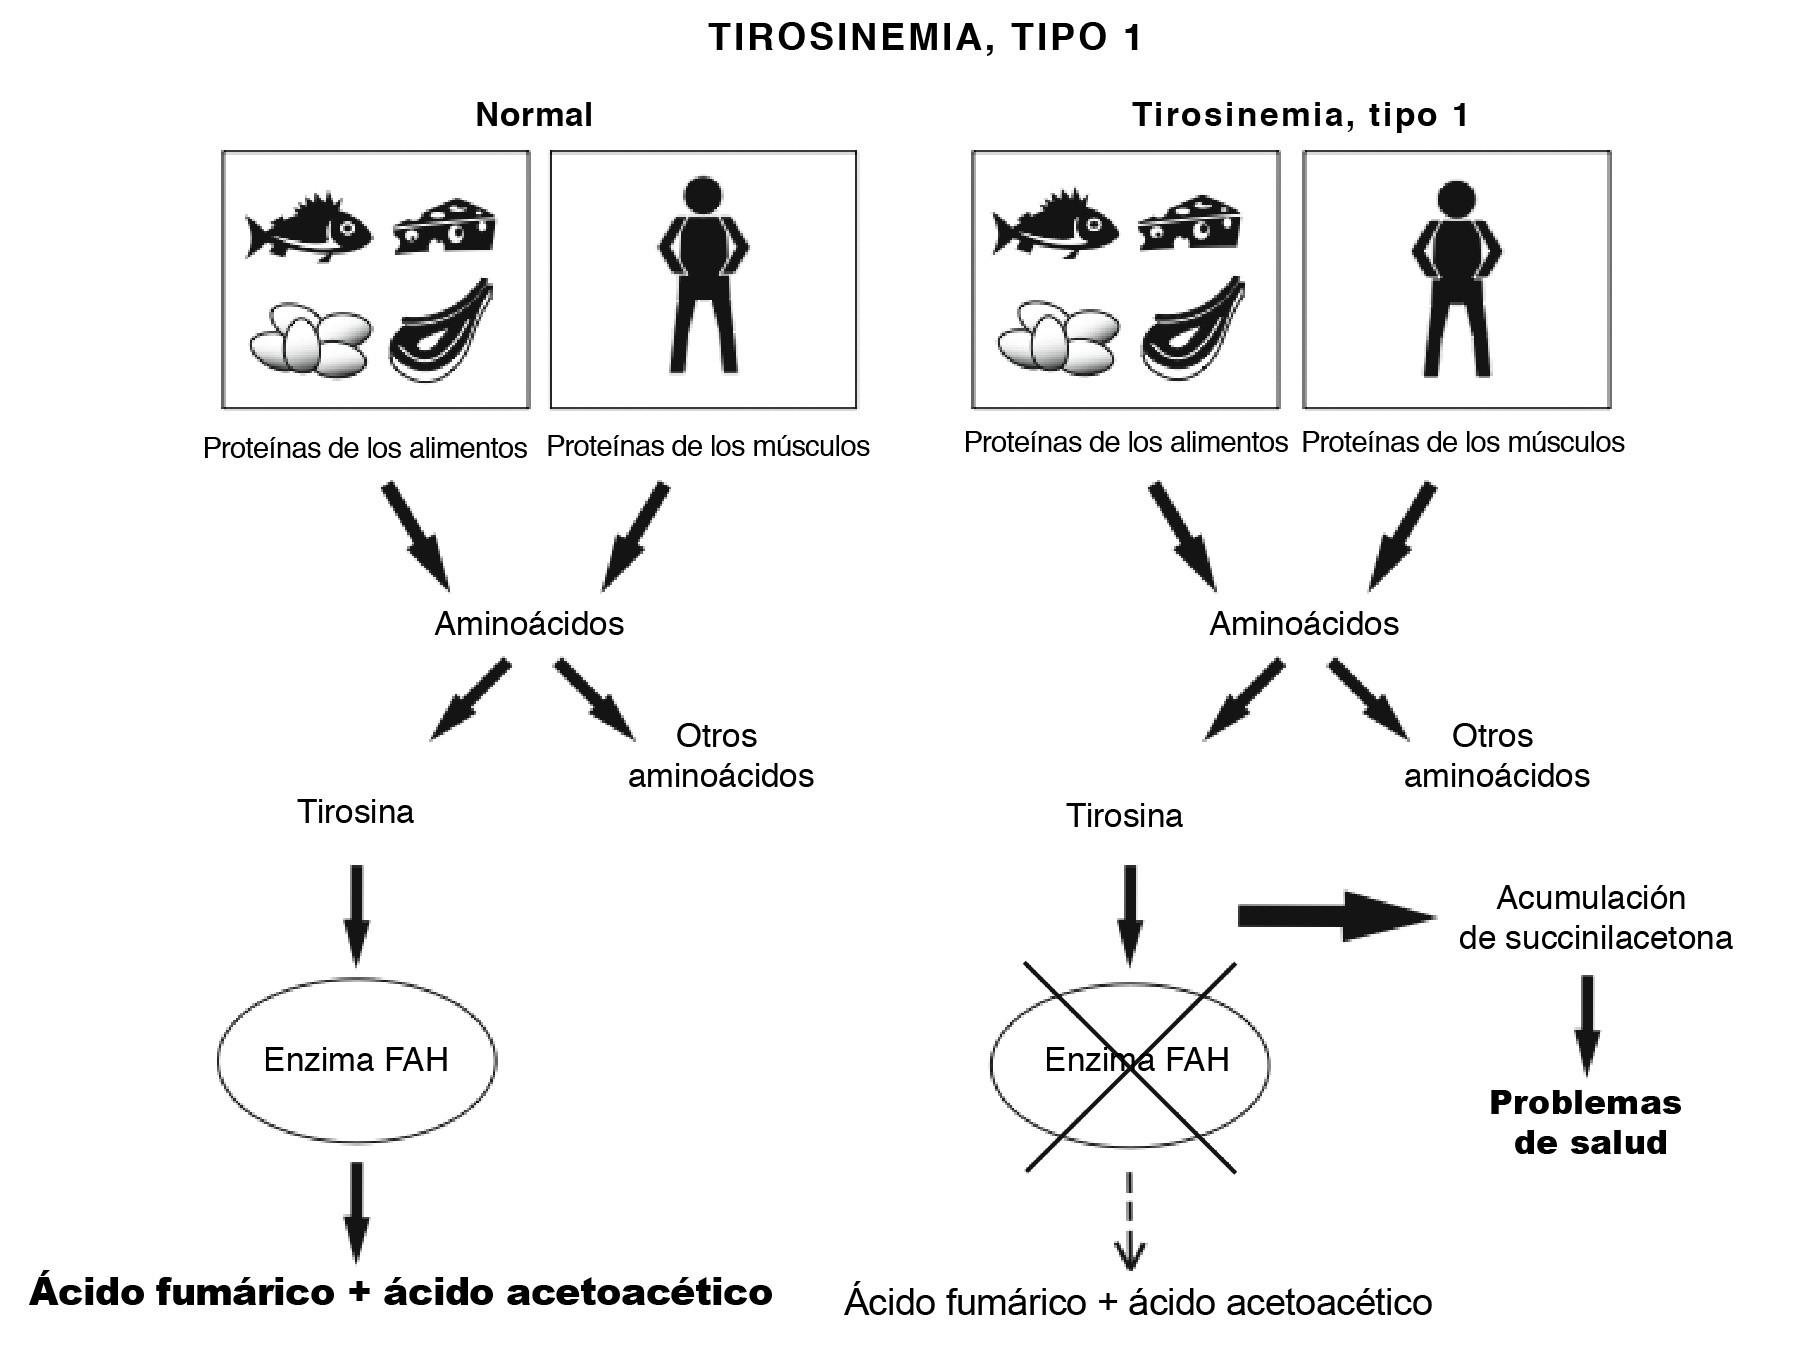 Tyrosinemia Diagram